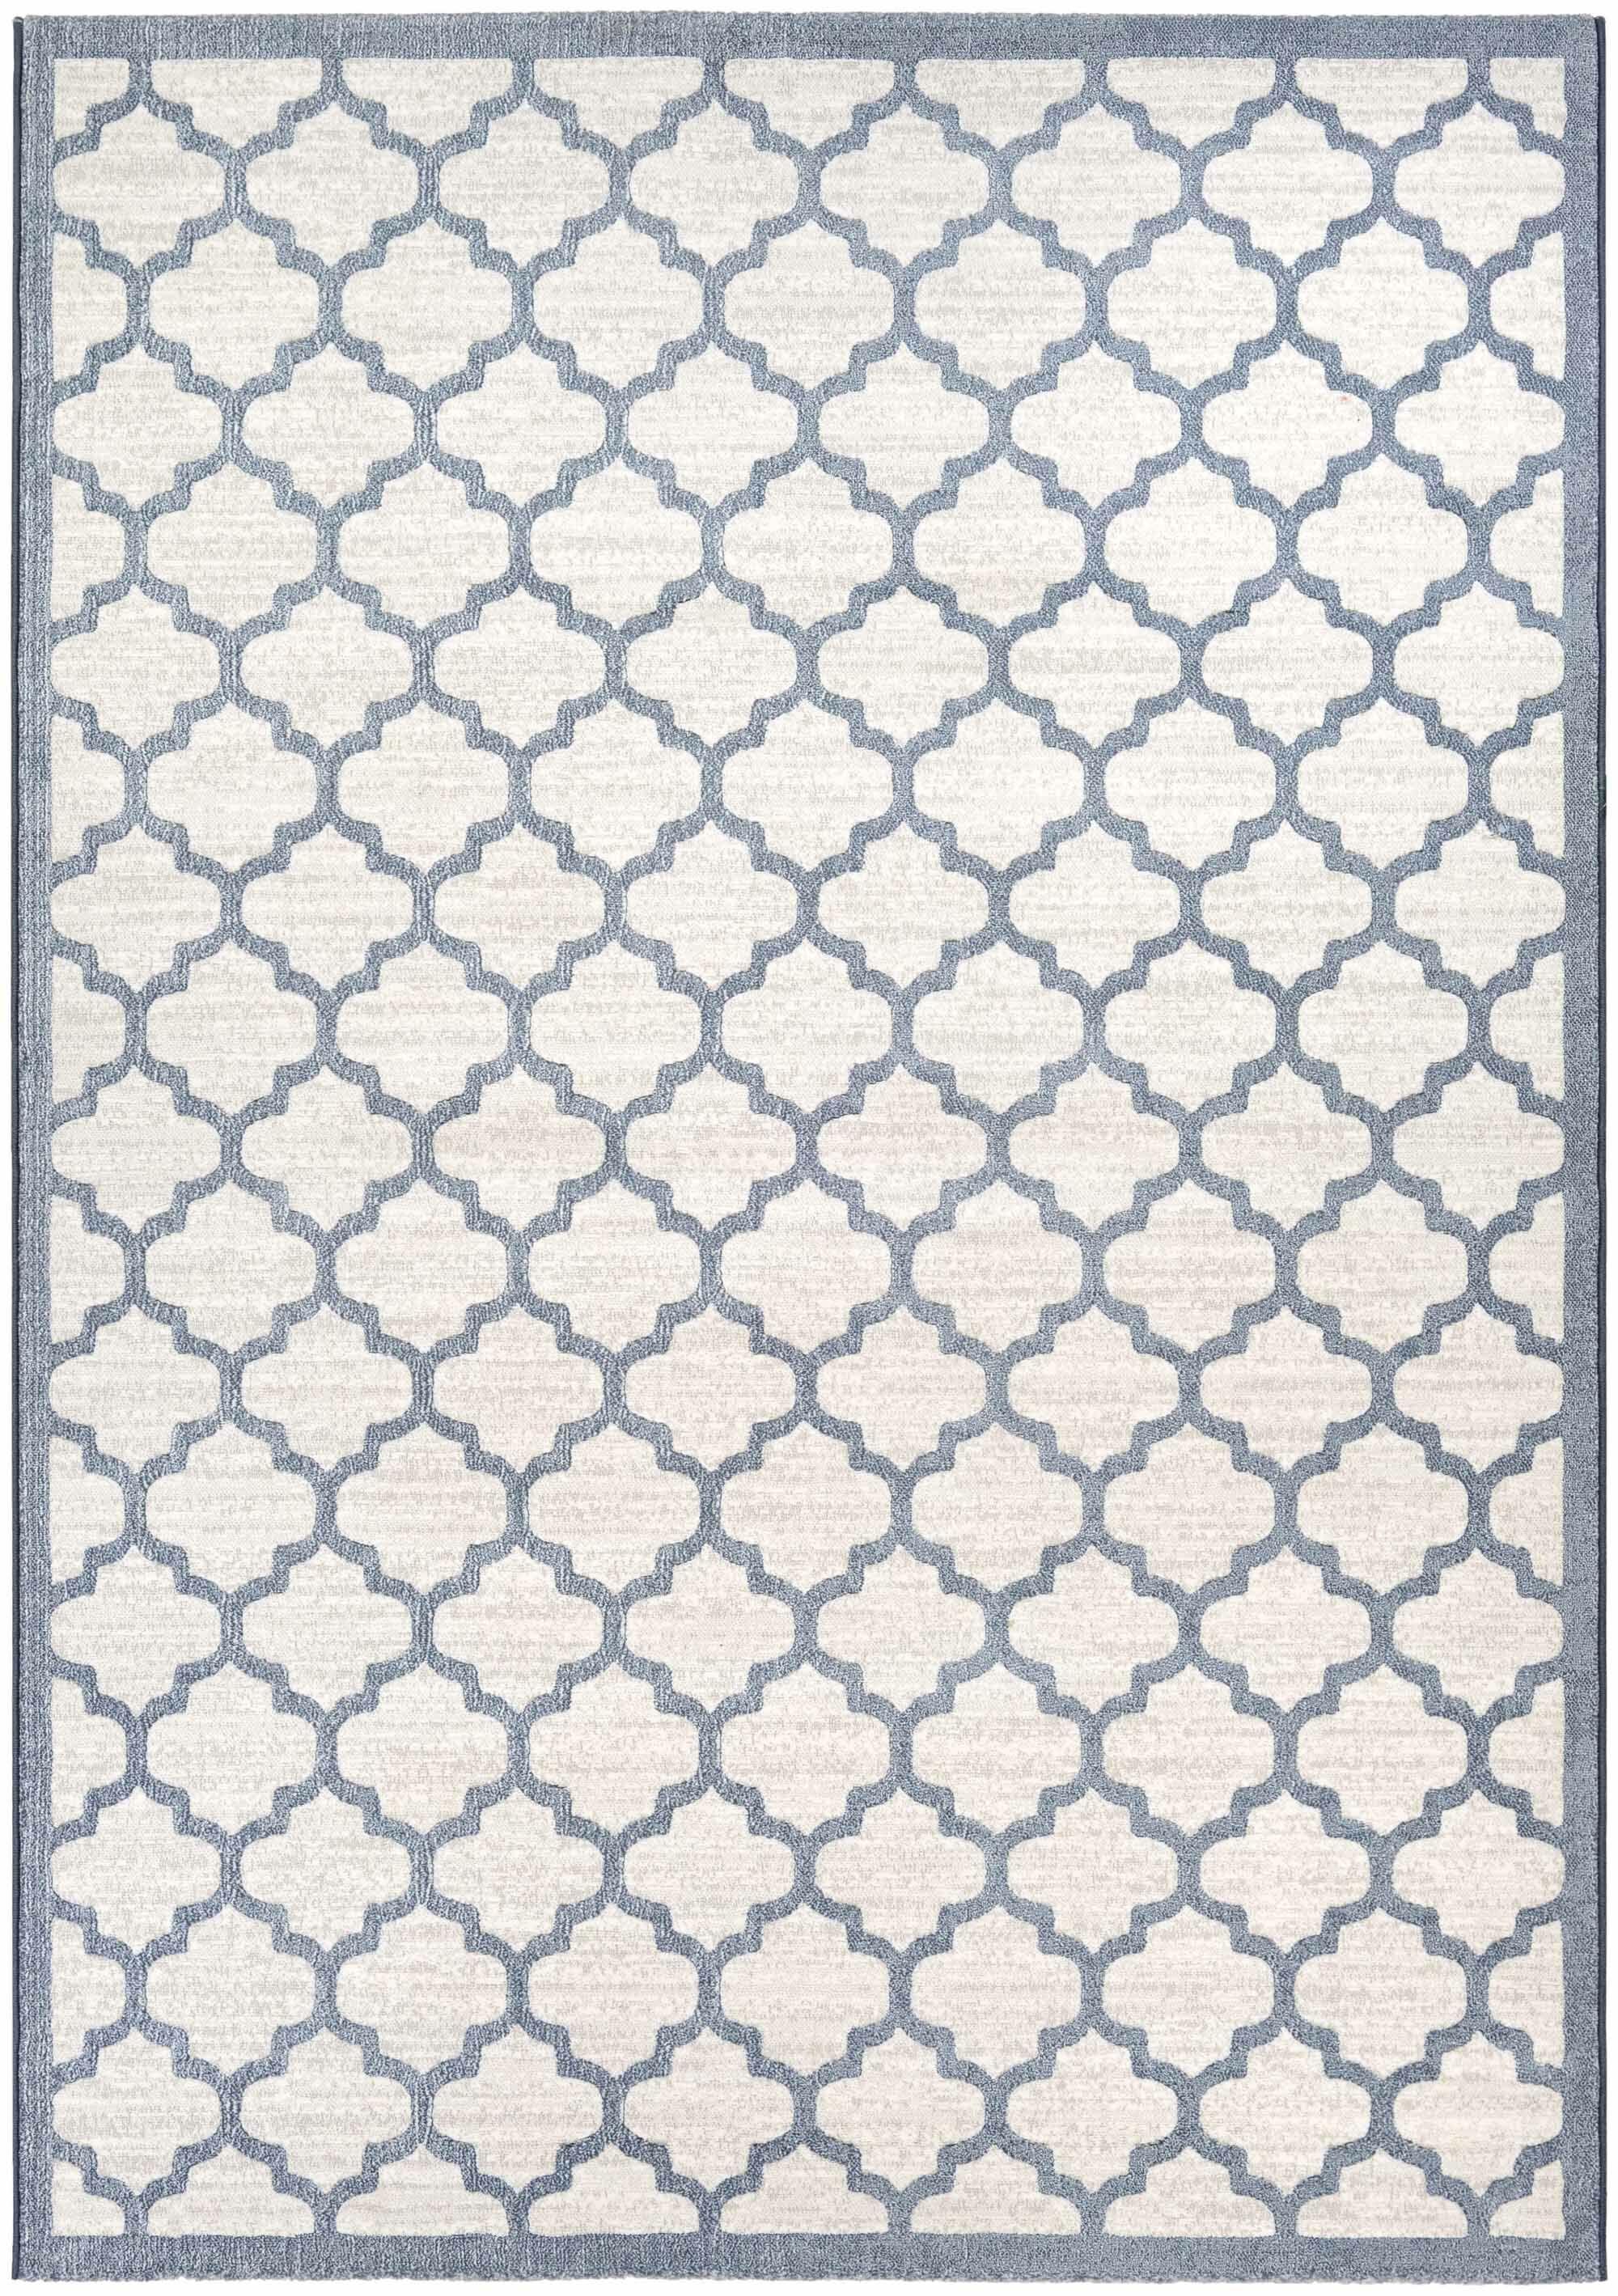 Goldsmith Oyster/Slate Blue Area Rug Rug Size: Rectangle 5'3